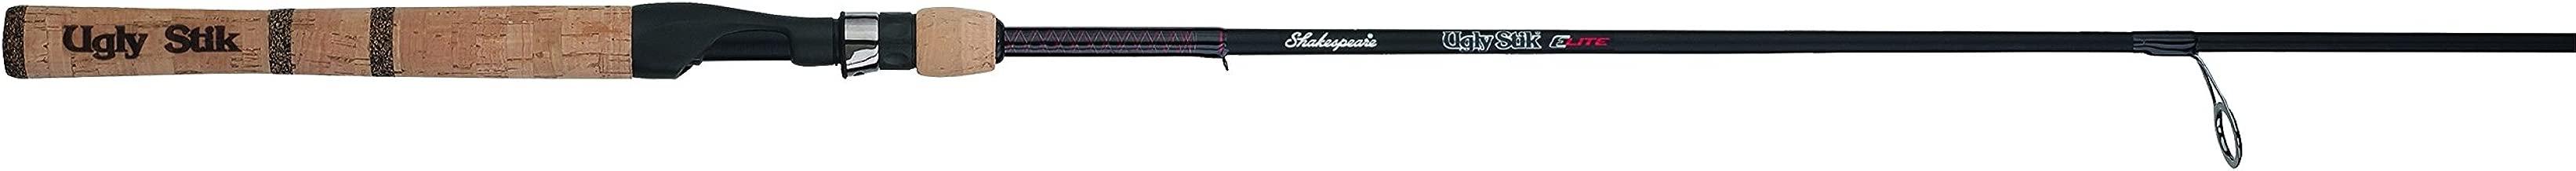 Ugly Stik Elite Spinning Rod 5'6